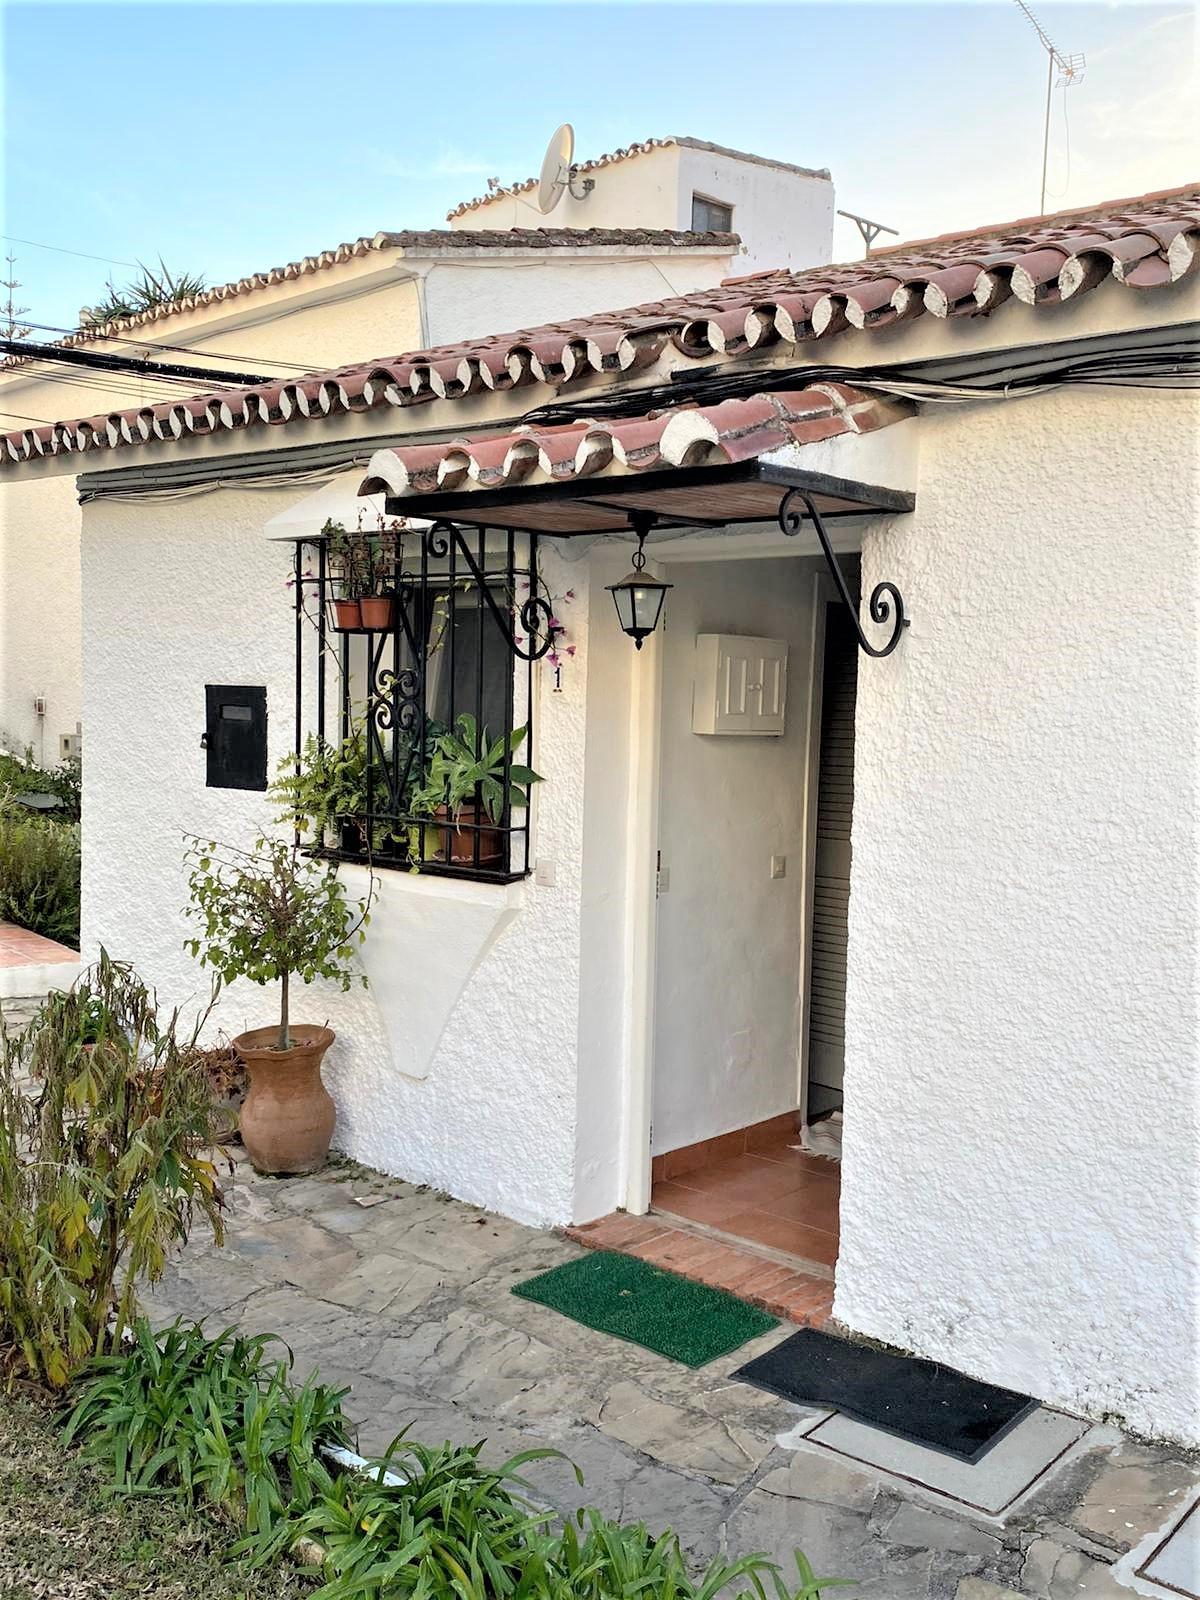 1 Bedroom Townhouse For Sale Marbella, Costa del Sol - HP3837712